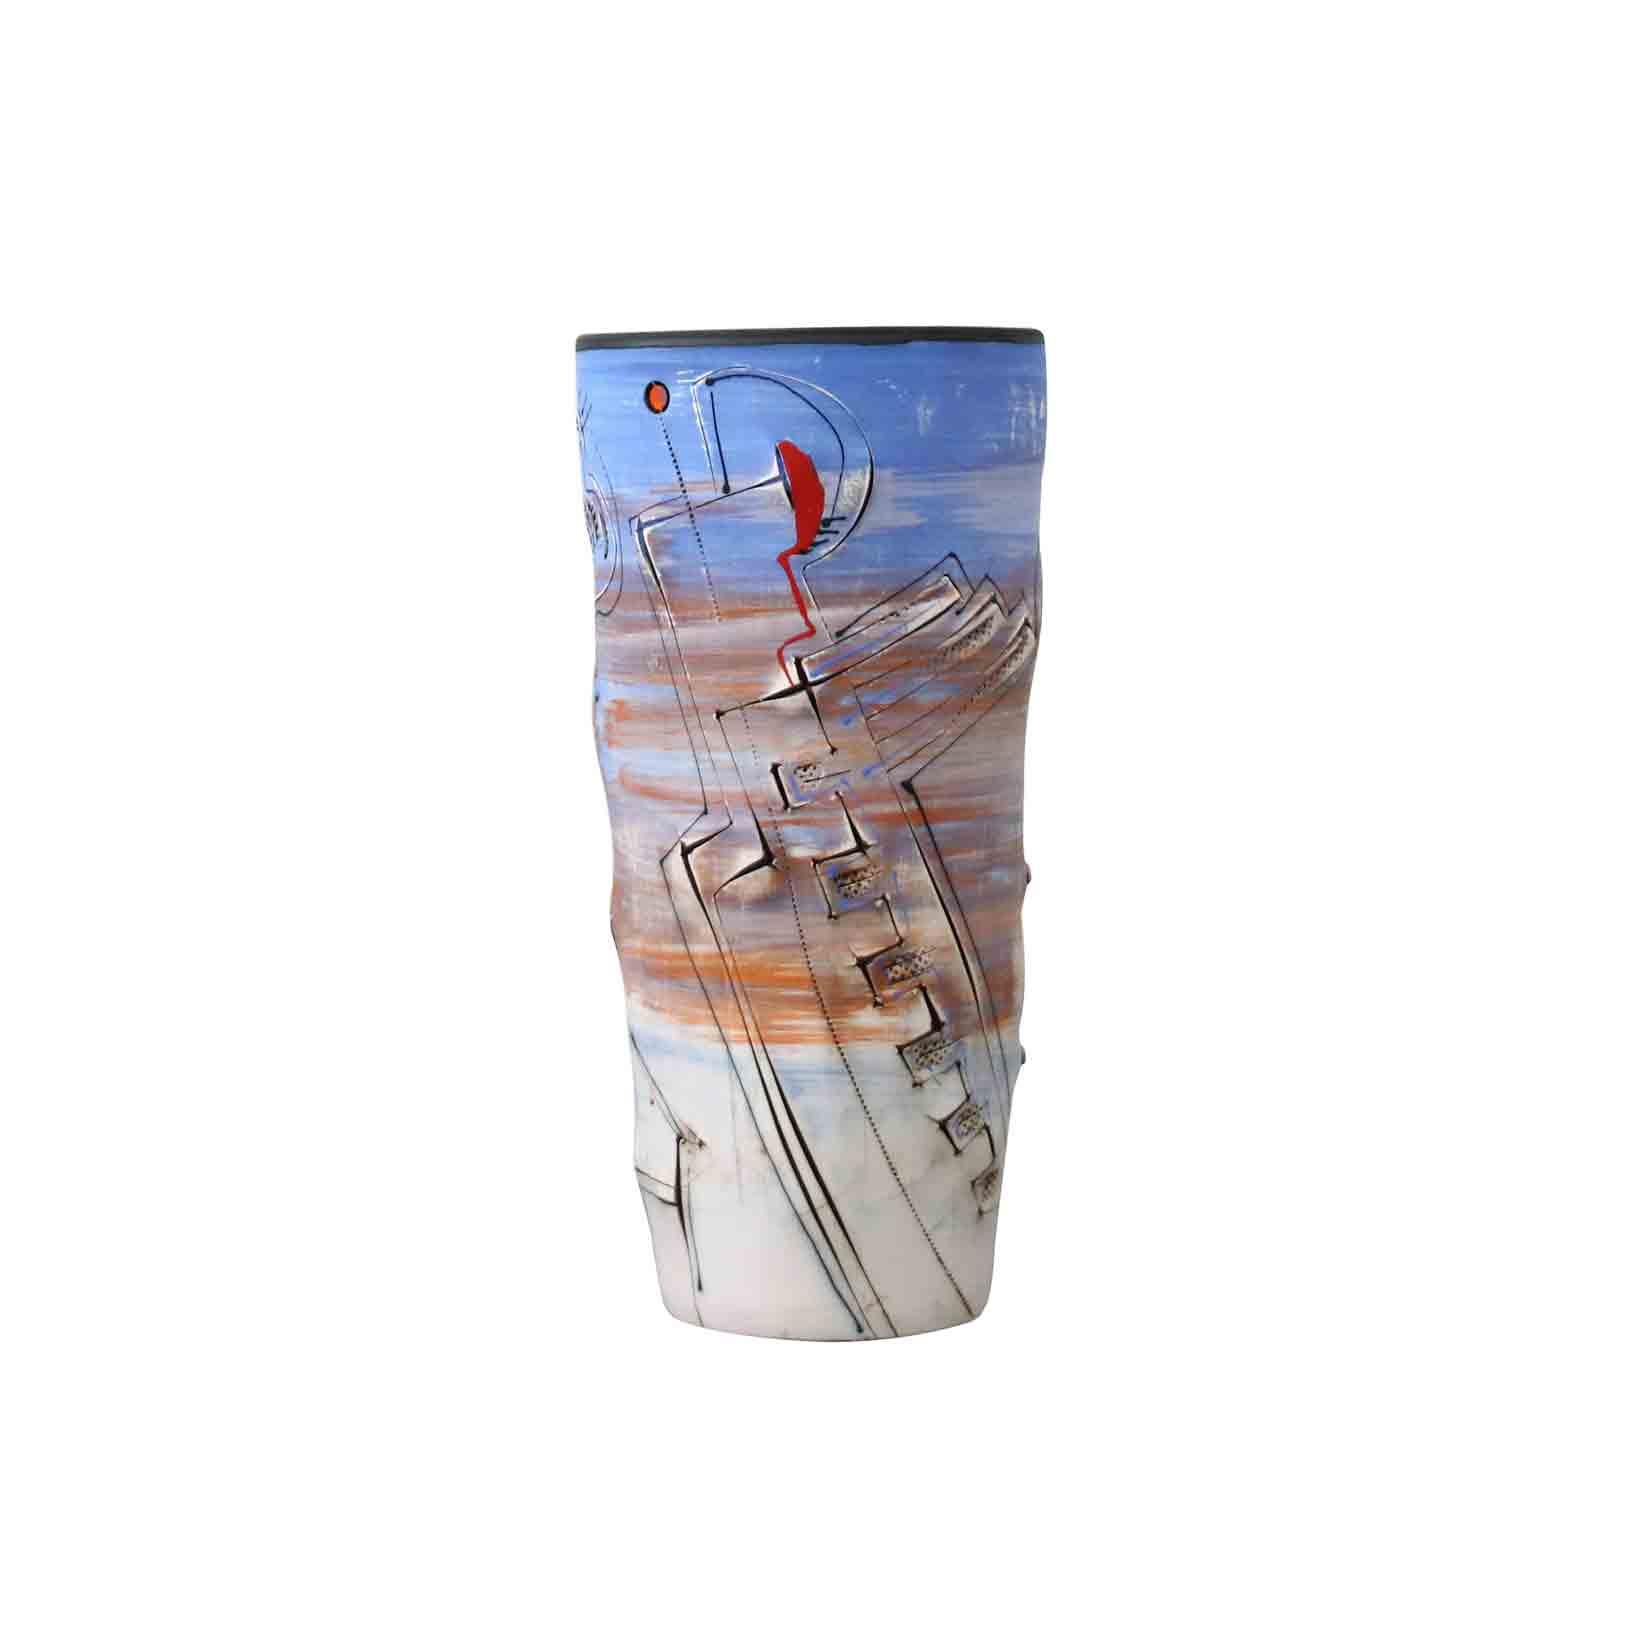 Imiso Ceramics | 2020| Eclectica Contemporary | Gallery | Cape Town |